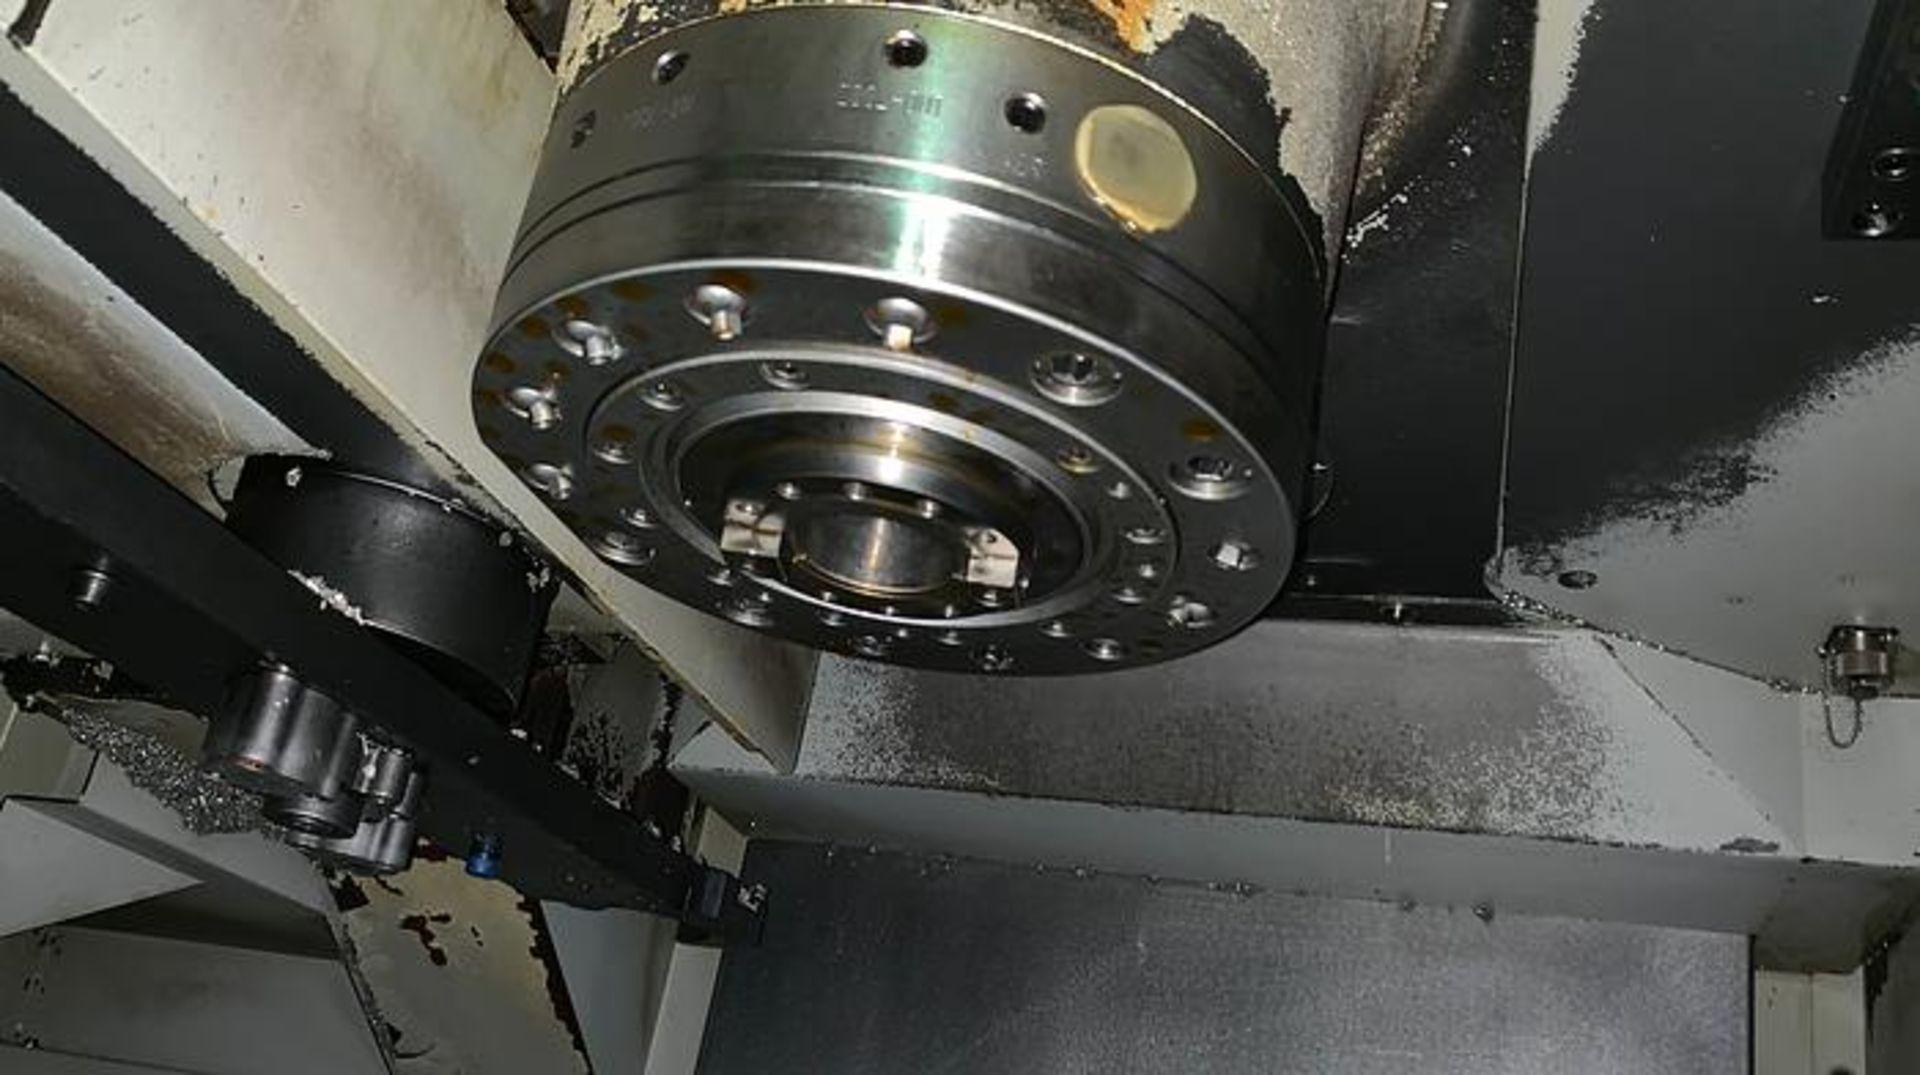 "HARDINGE XR760 CNC VMC PRODUCTION CENTER 30""X24""X24"", YEAR 2010, SN XRAB0A0001 - Image 10 of 12"